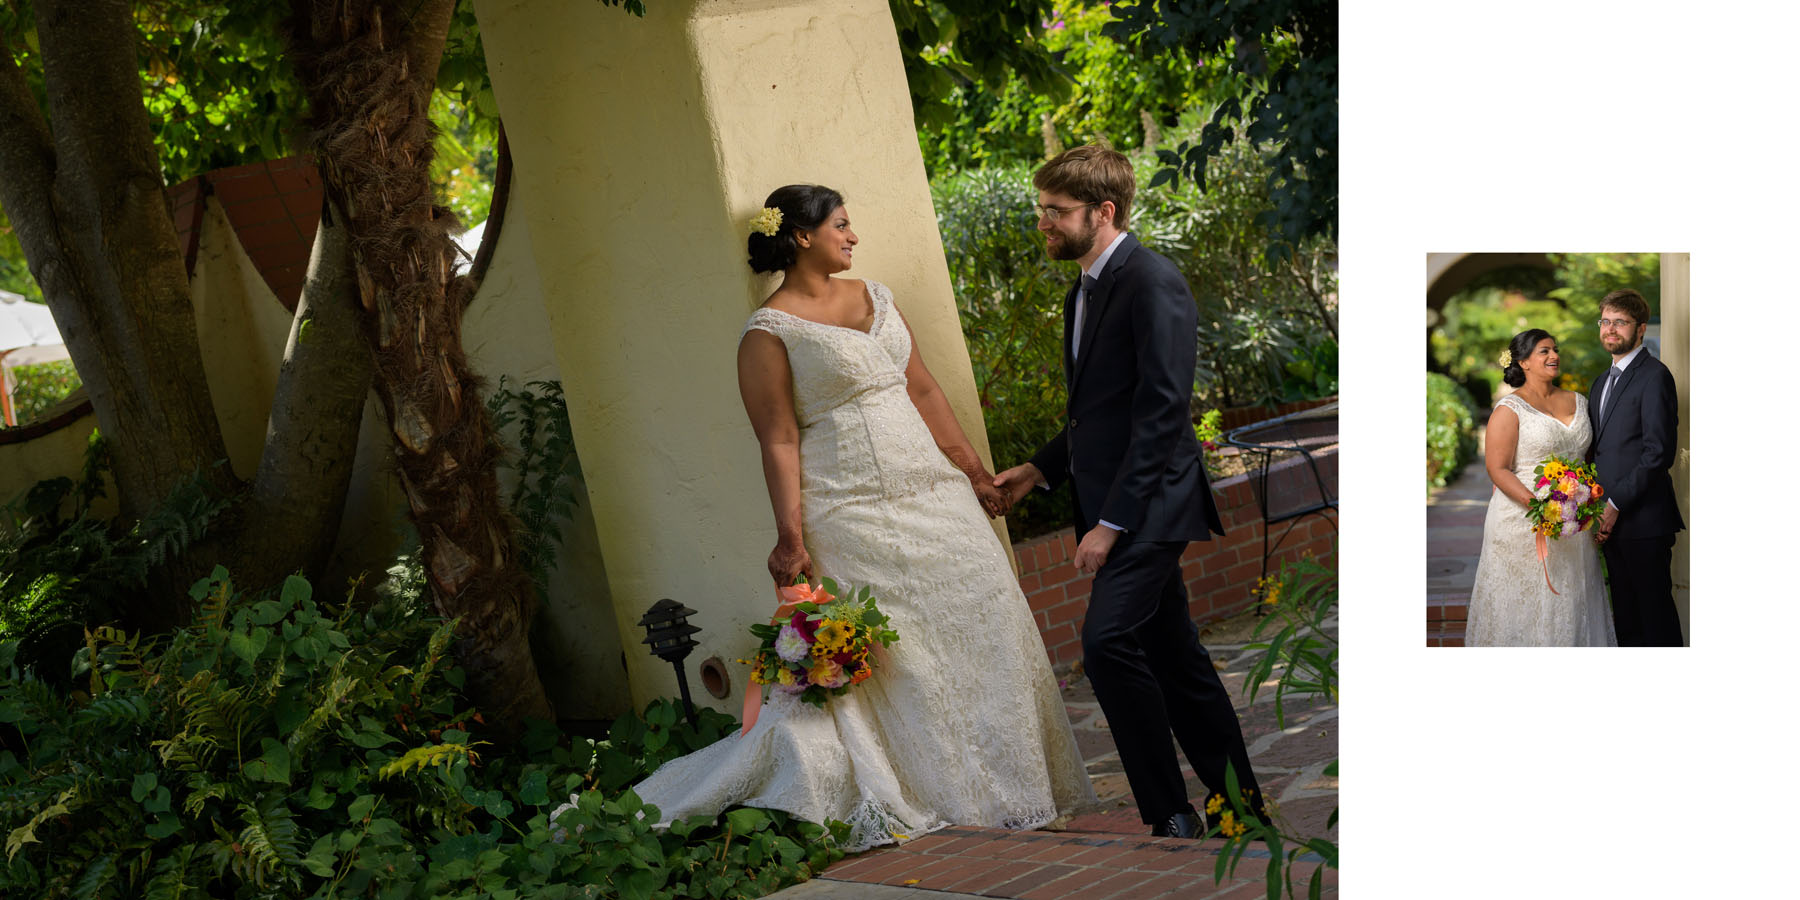 bride and groom formals –Allied Arts Guild –Menlo Park wedding photos –by Bay Area wedding photographer Chris Schmauch